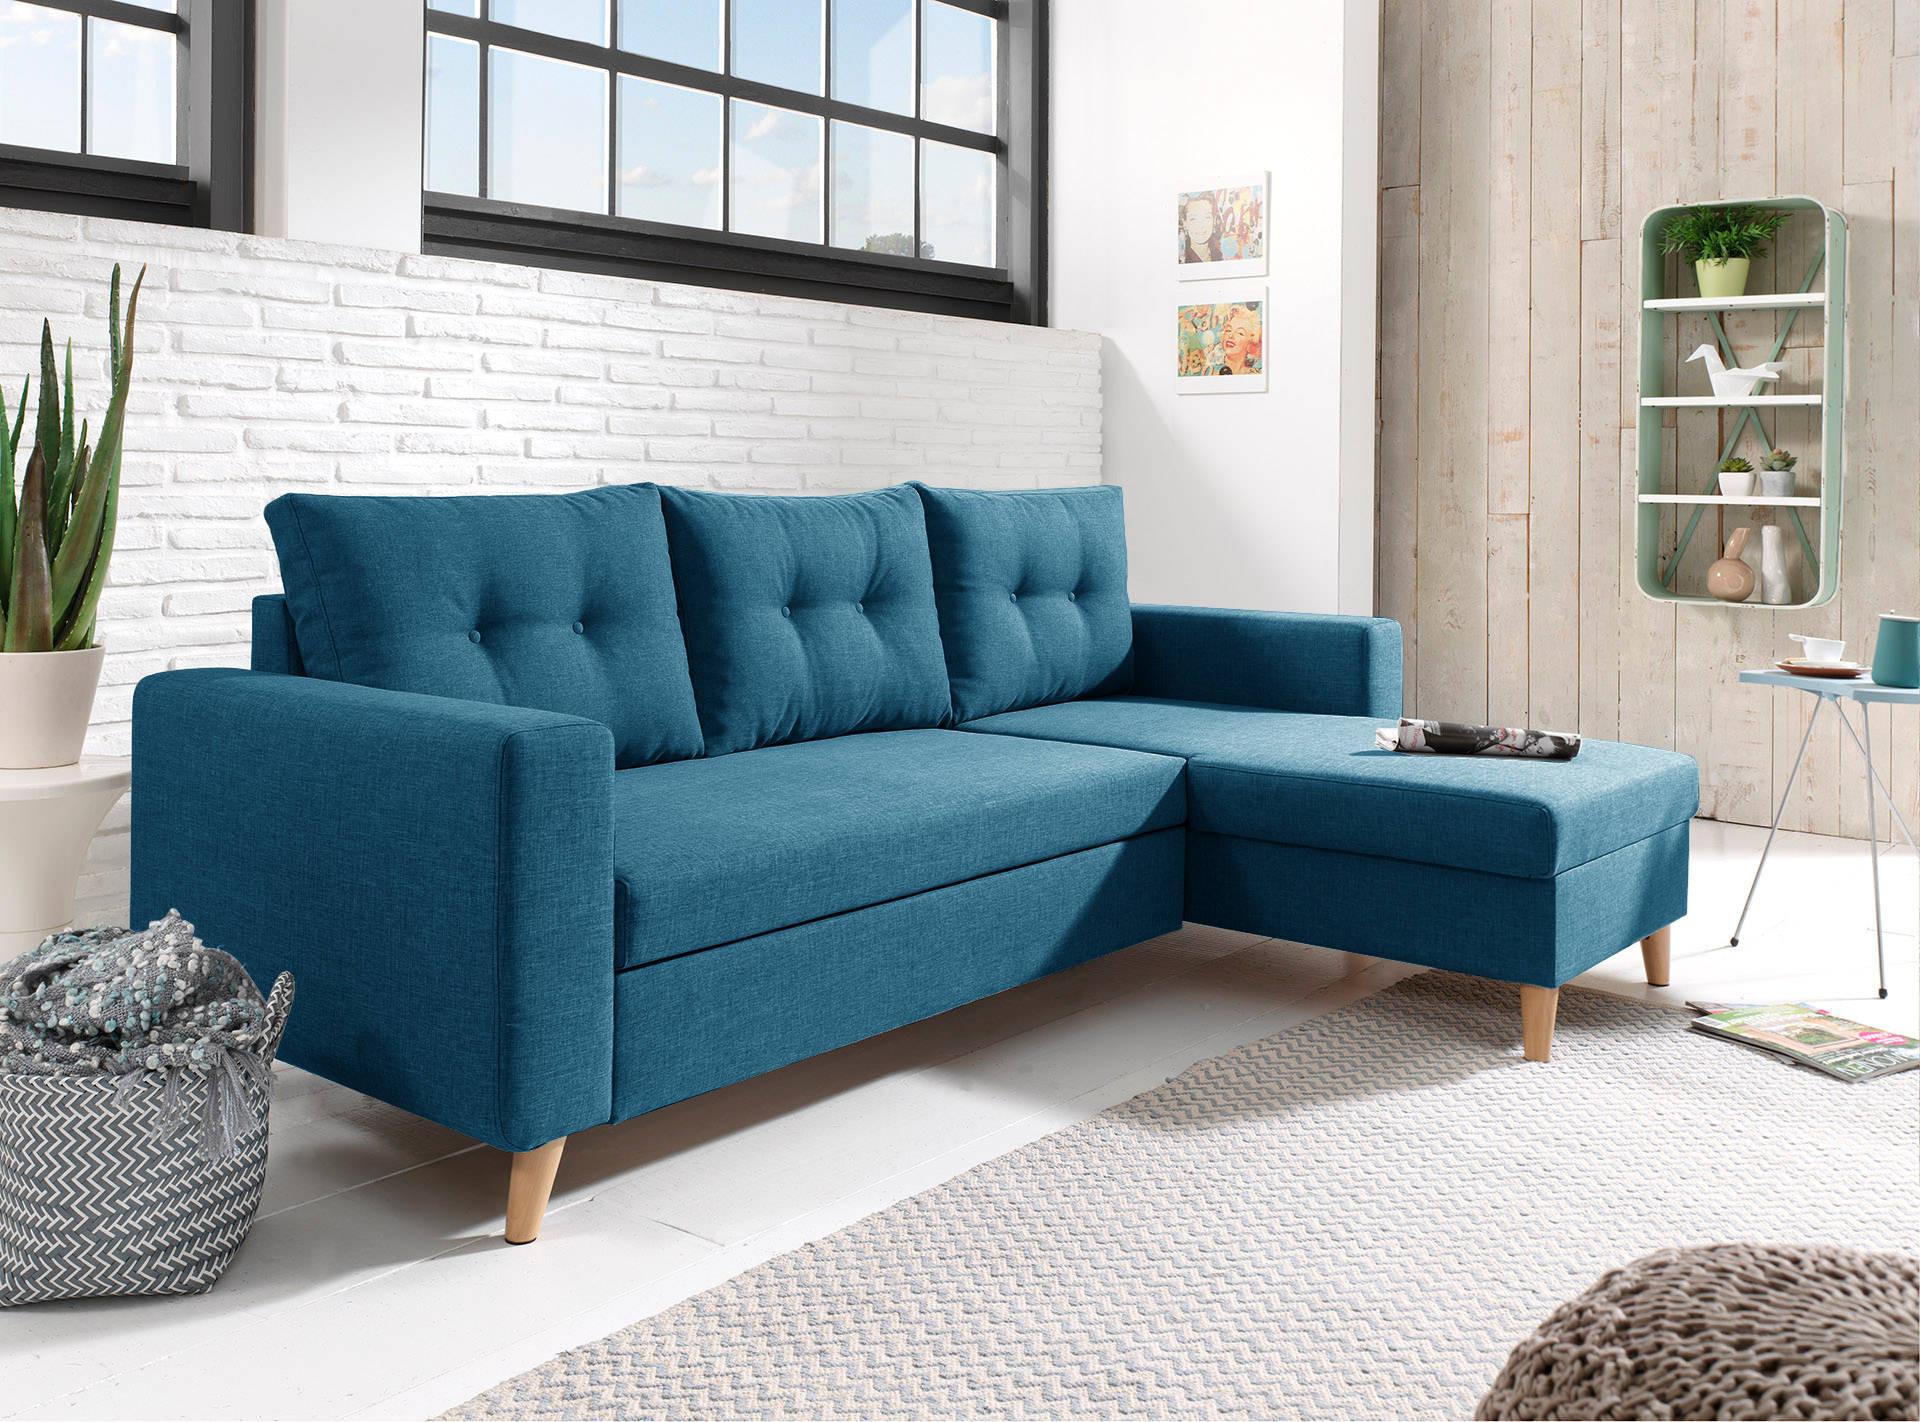 Salon Gris Et Bleu Canard nordic - canapé d'angle scandinave bleu canard réversible et